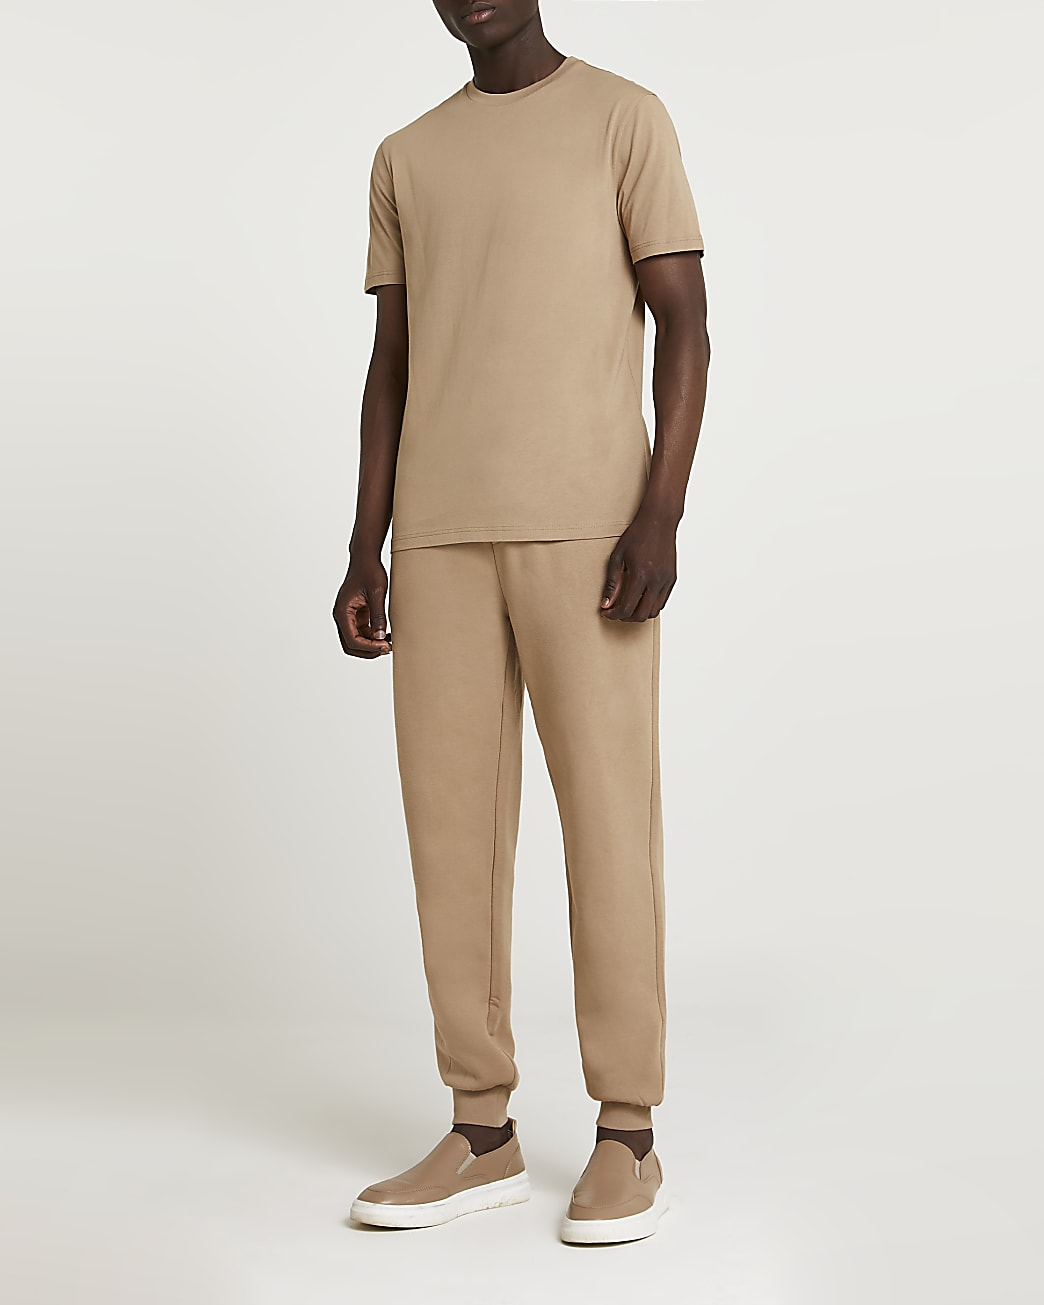 Stone RI slim fit t-shirt and joggers fit